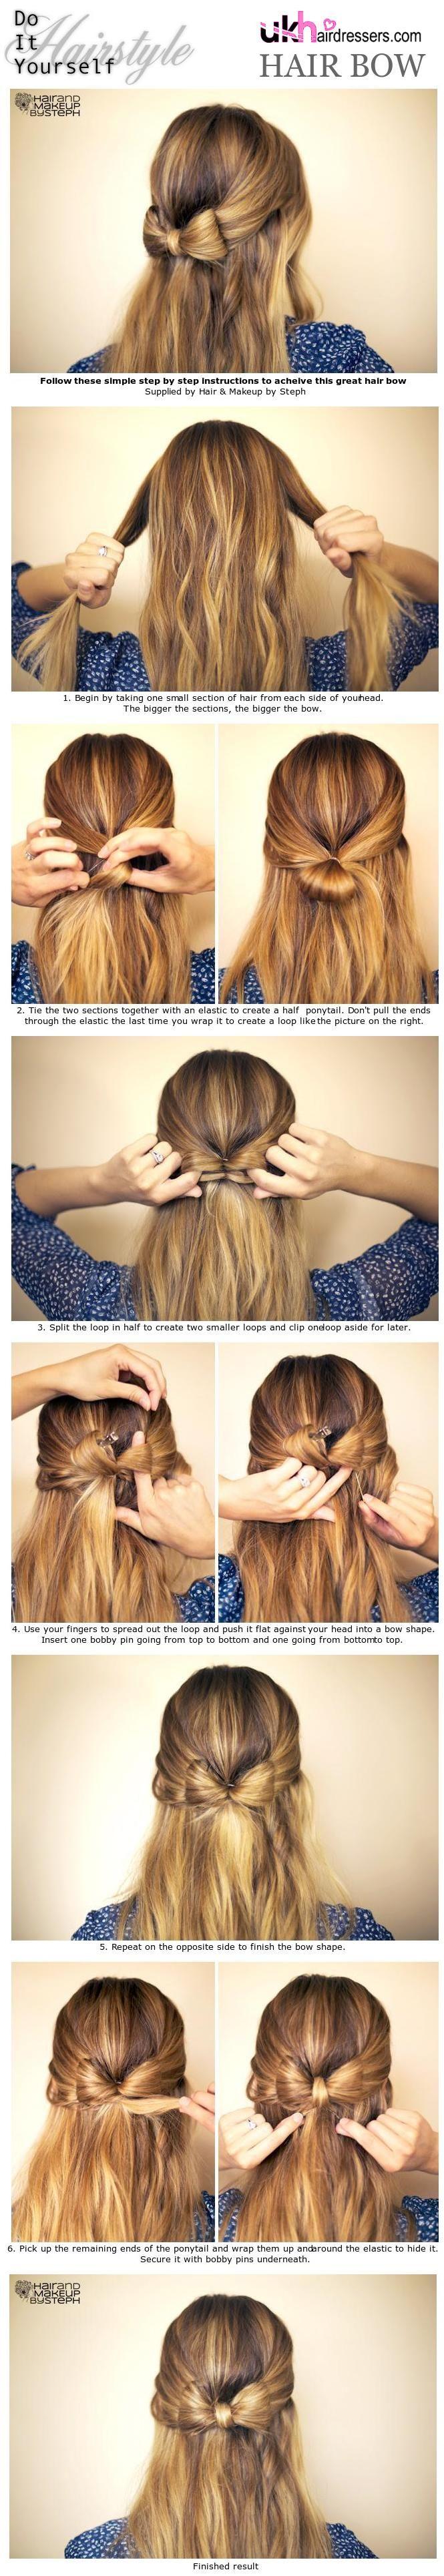 Hair Bow Hairstyle Tutorial